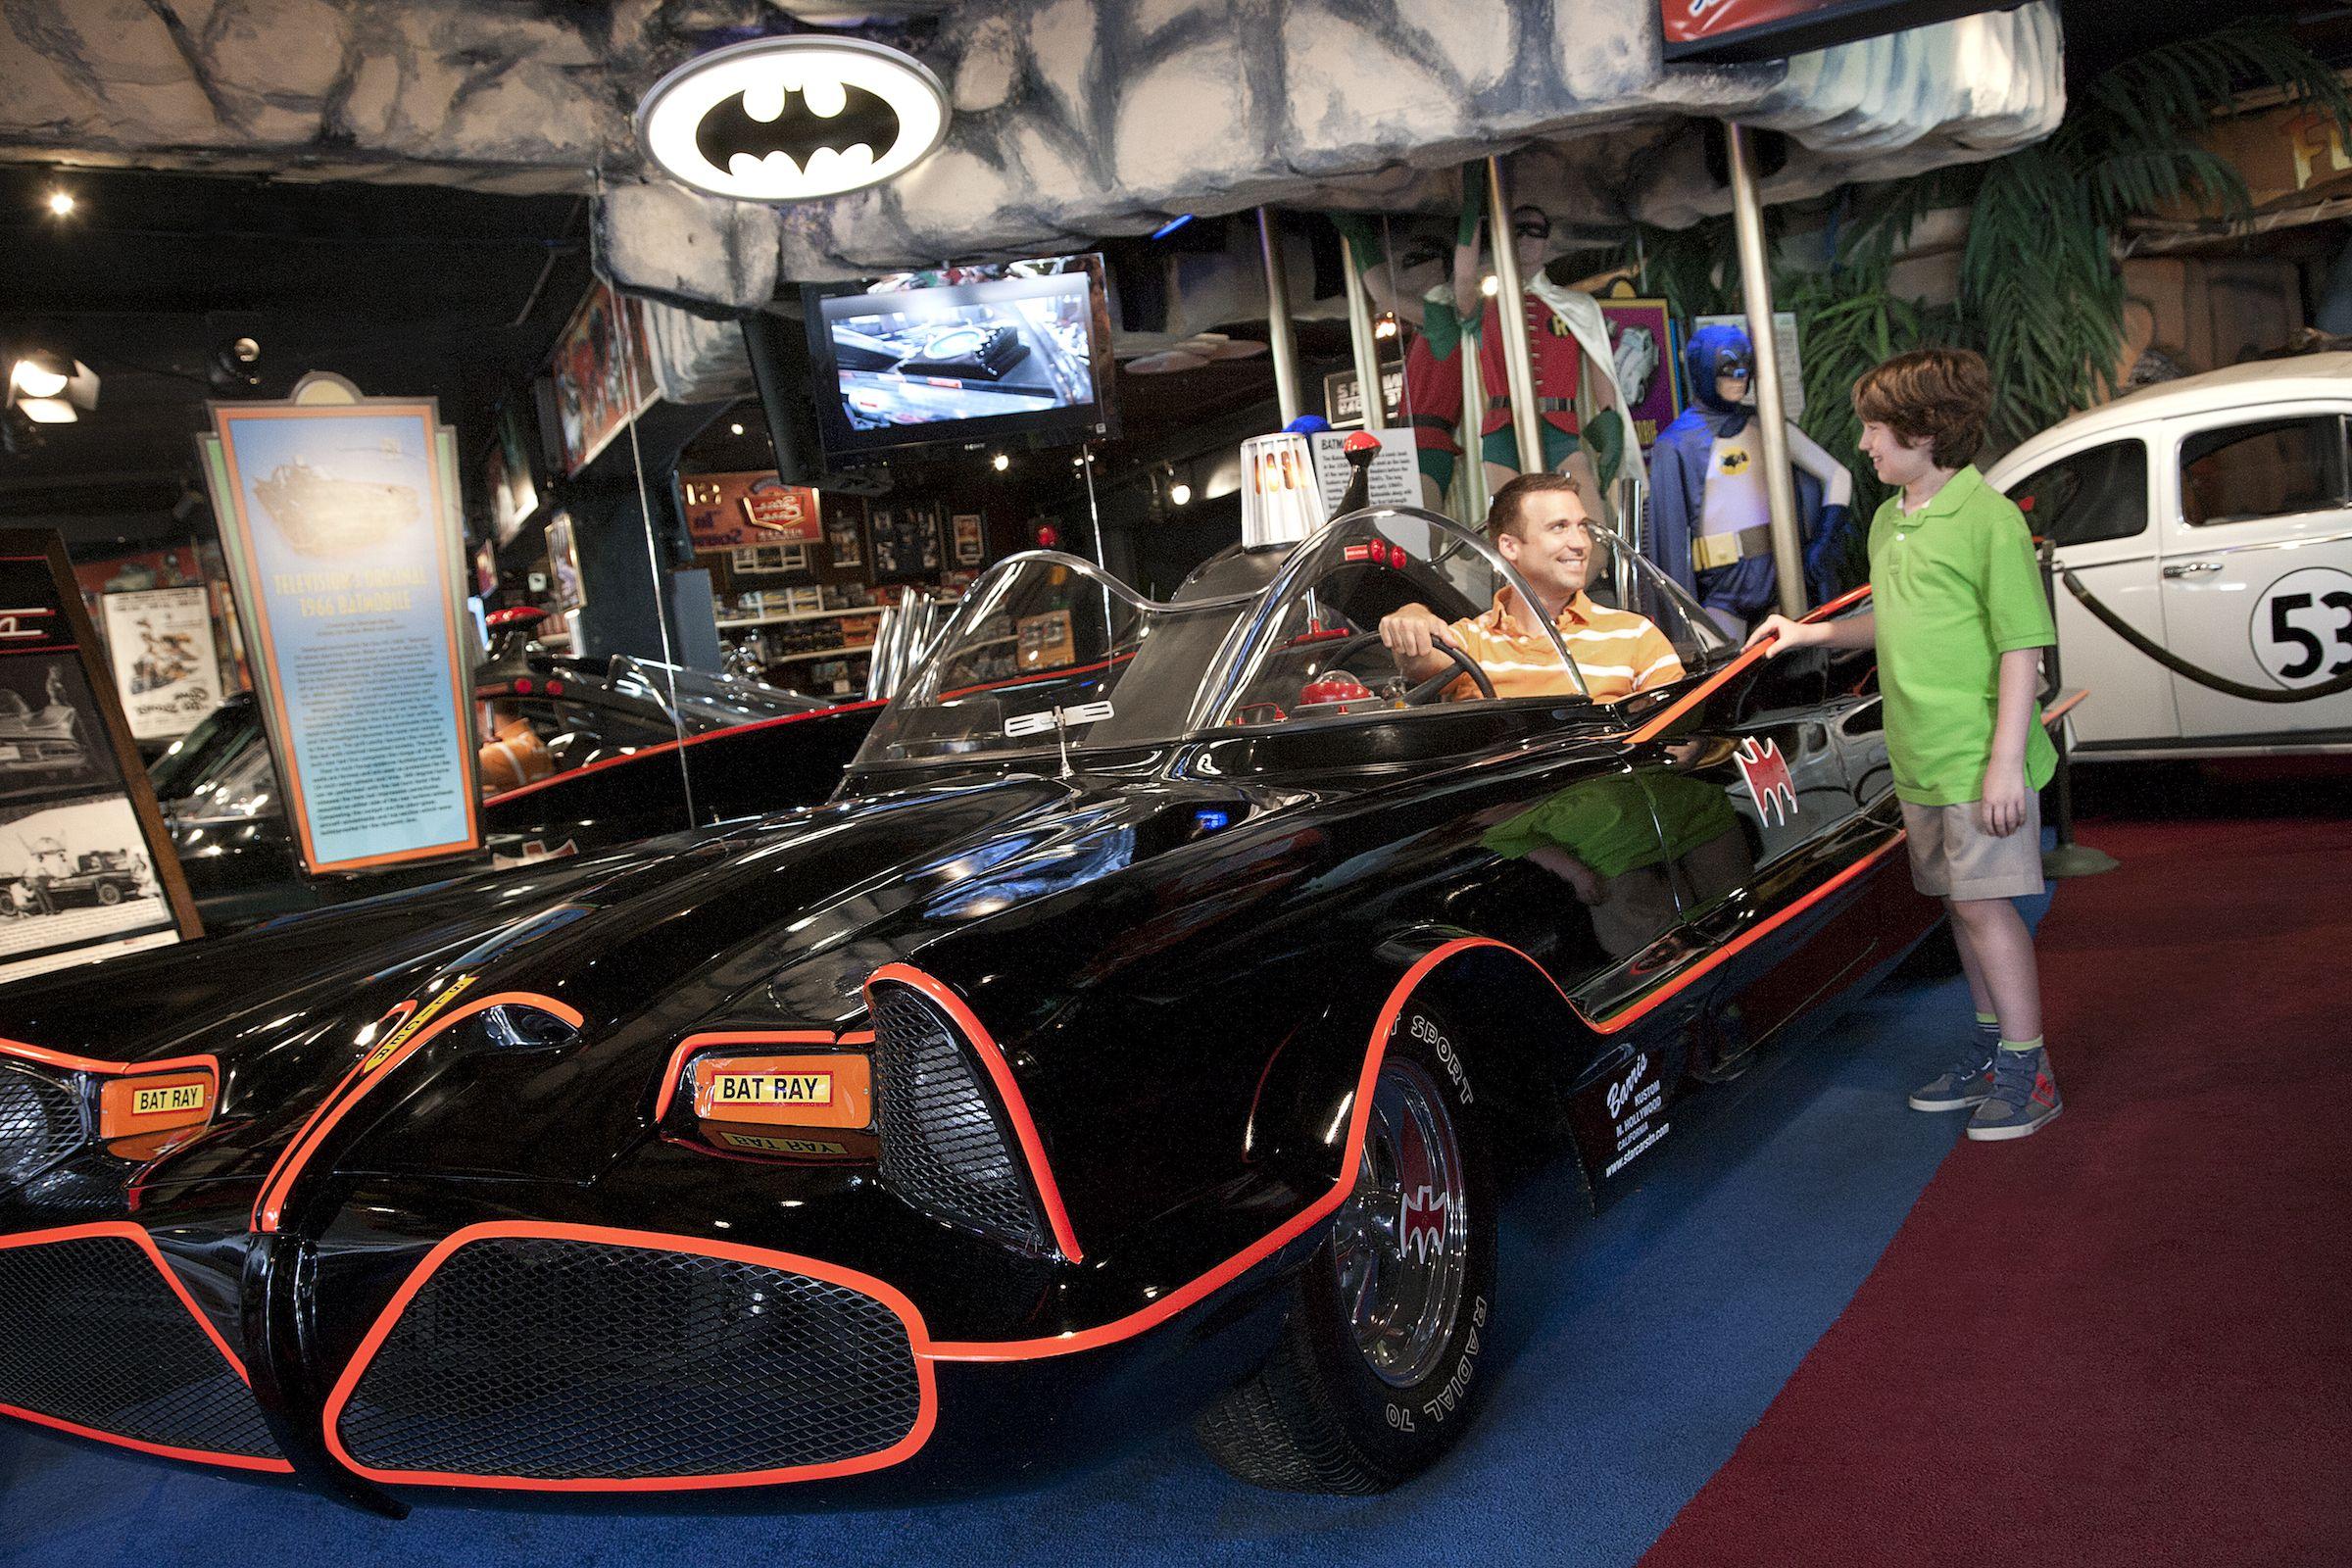 Did You Know The Original 1966 Batmobile Lives In Gatlinburg